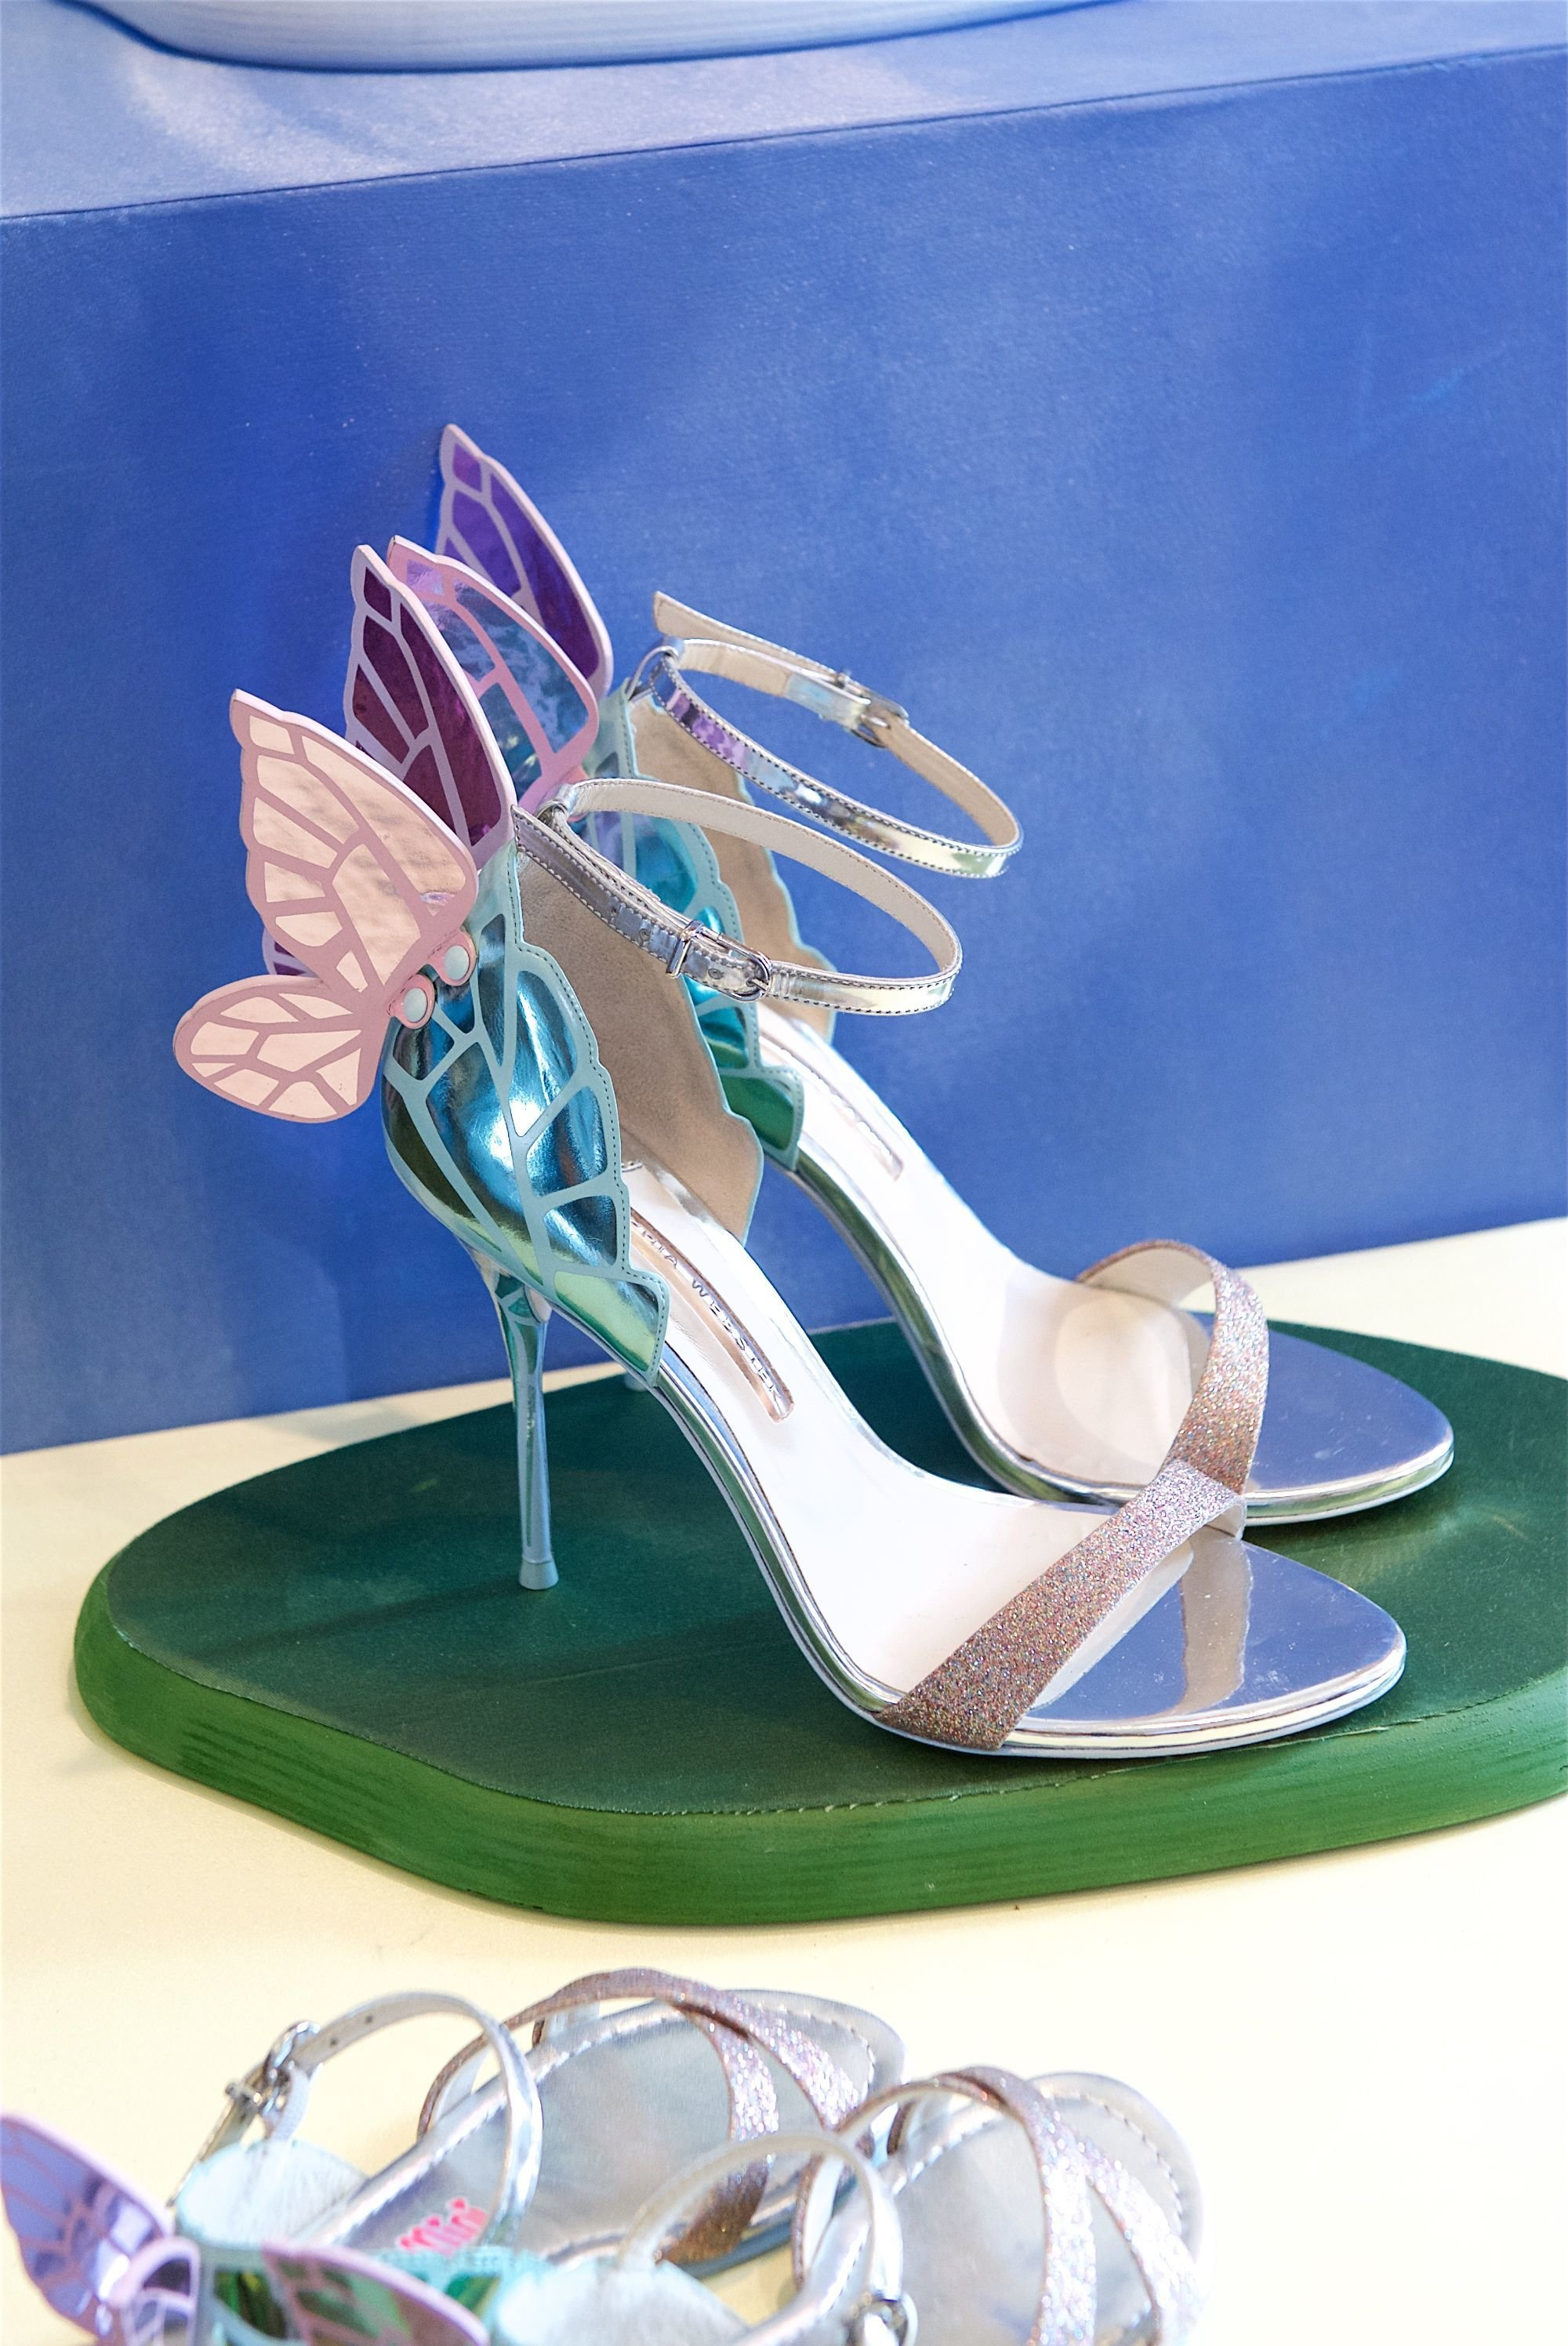 Shoes Sophia Webster presentation, Spring Summer 2018, London Fashion Week, UK - 18 Sep 2017, Image: 349785379, License: Rights-managed, Restrictions: , Model Release: no, Credit line: Profimedia, TEMP Rex Features